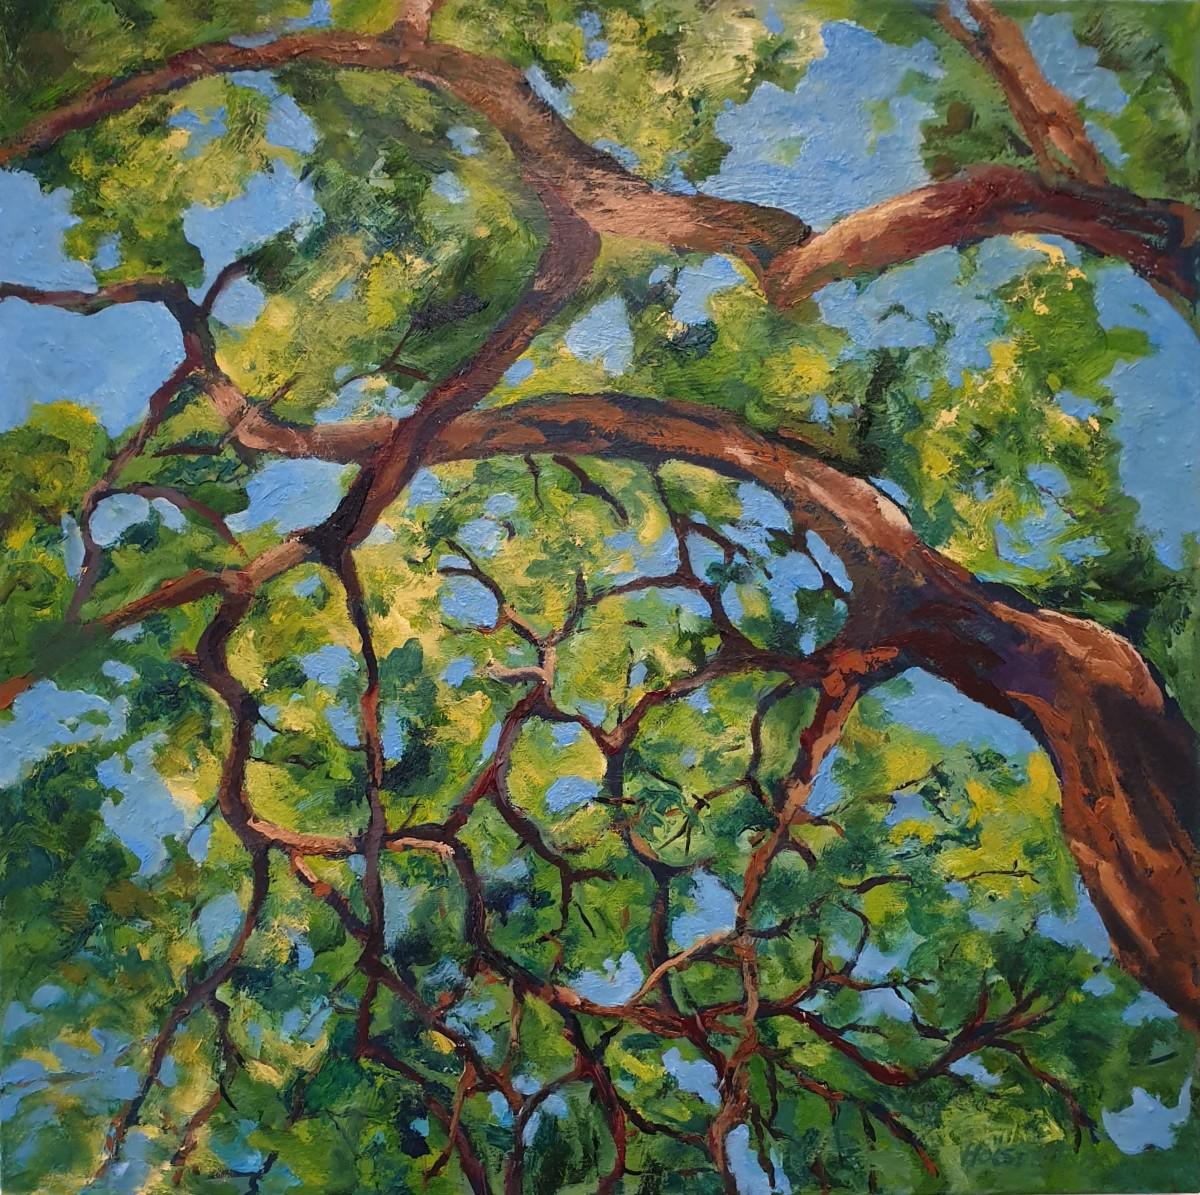 Branch Lace by Kit Hoisington